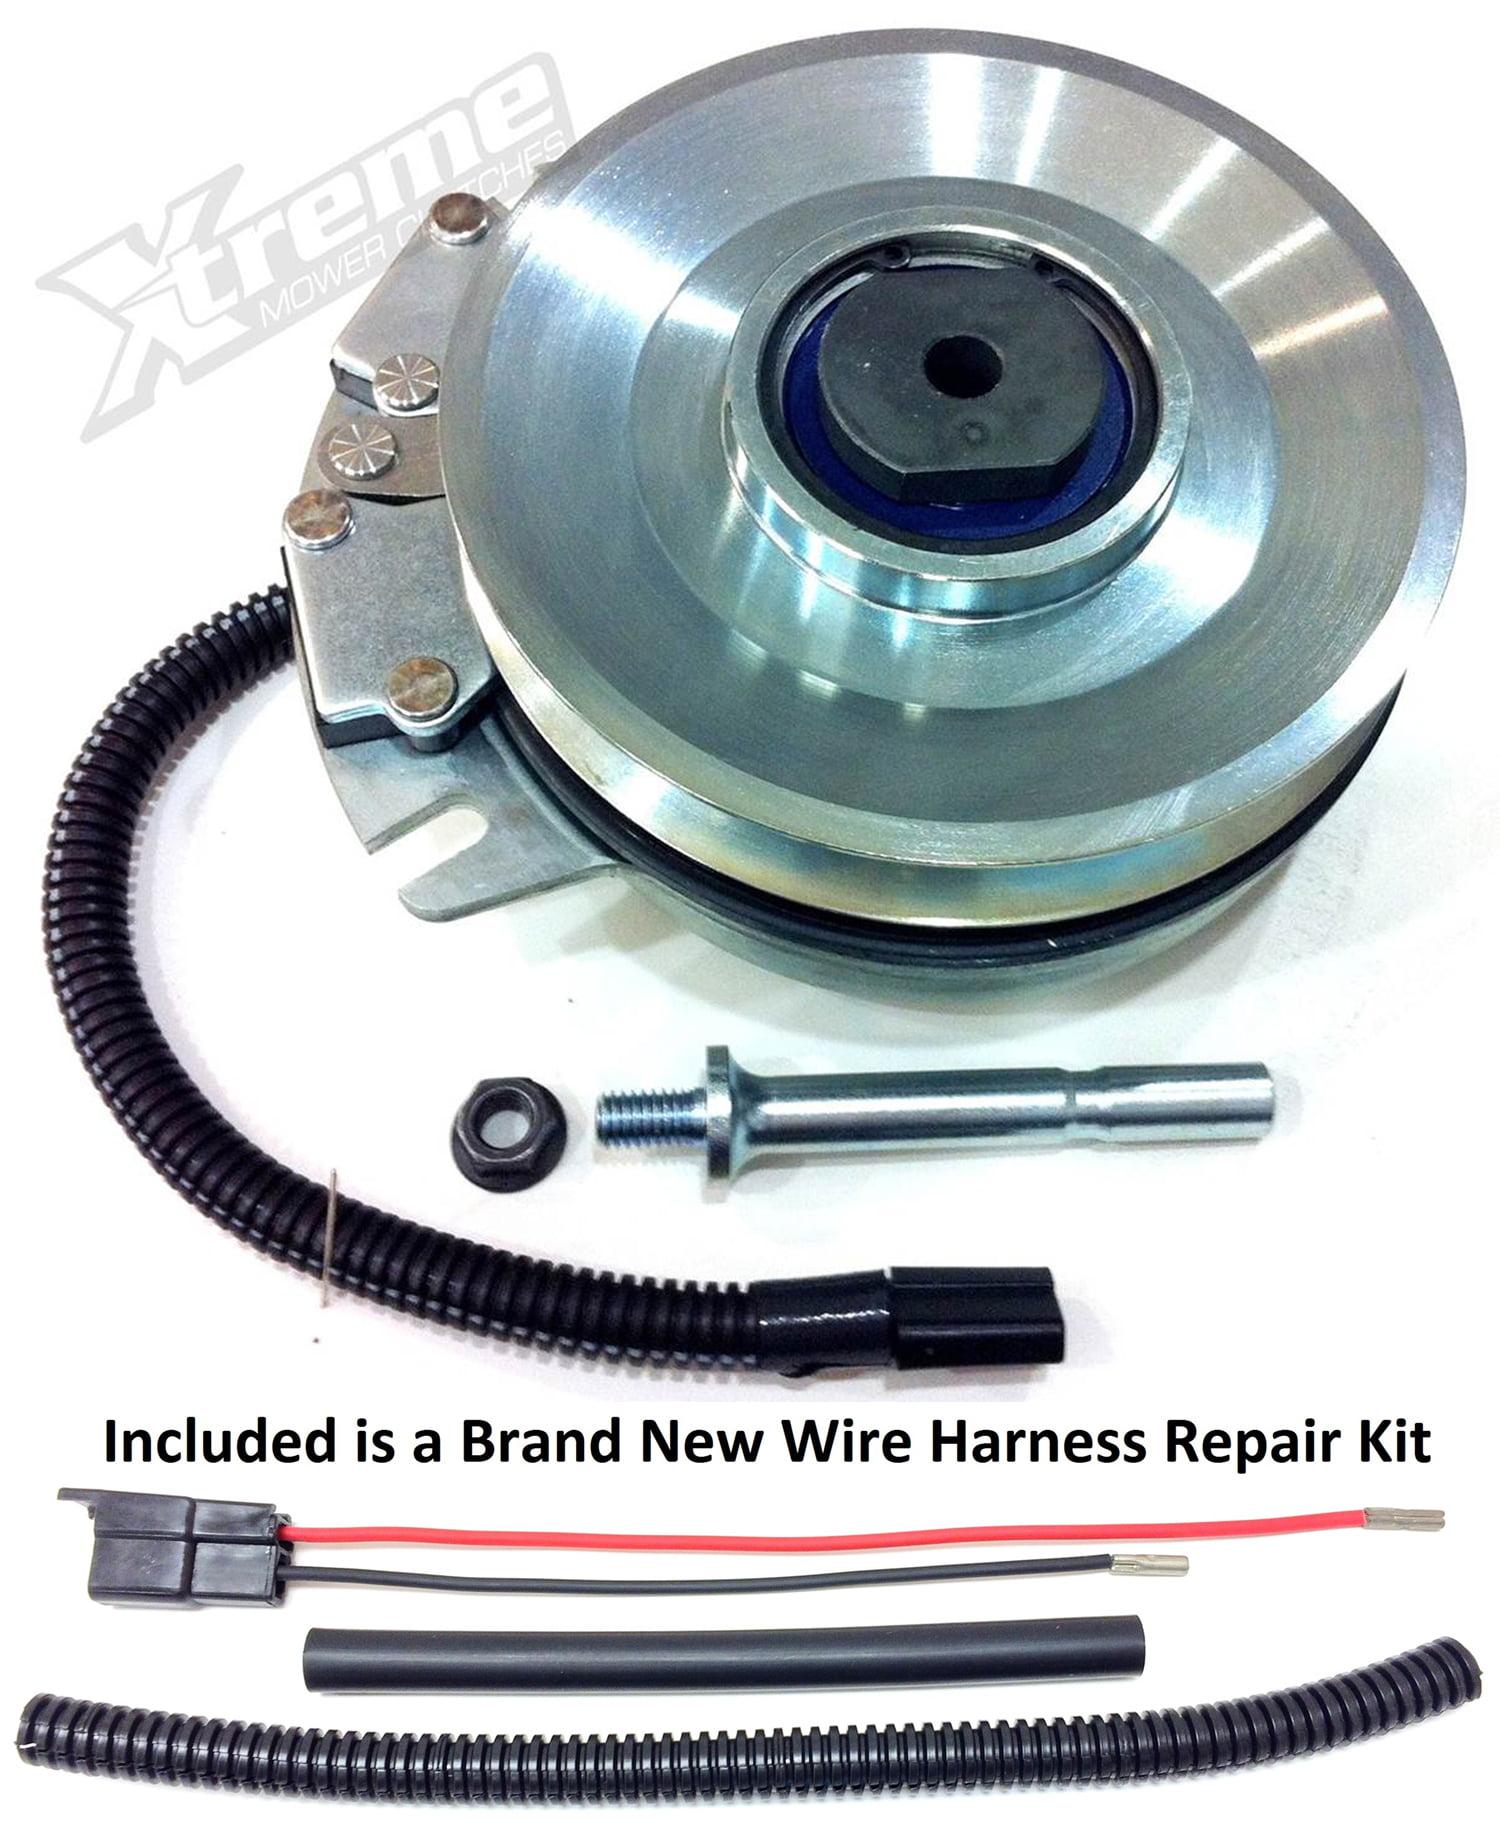 Bundle - 2 items: PTO Electric Blade Clutch, Wire Harness Repair Kit.  Replaces John Deere PTO Clutch Z-Trak Z920A, Z925A, Z930A - w/ Wire Repair  Kit !